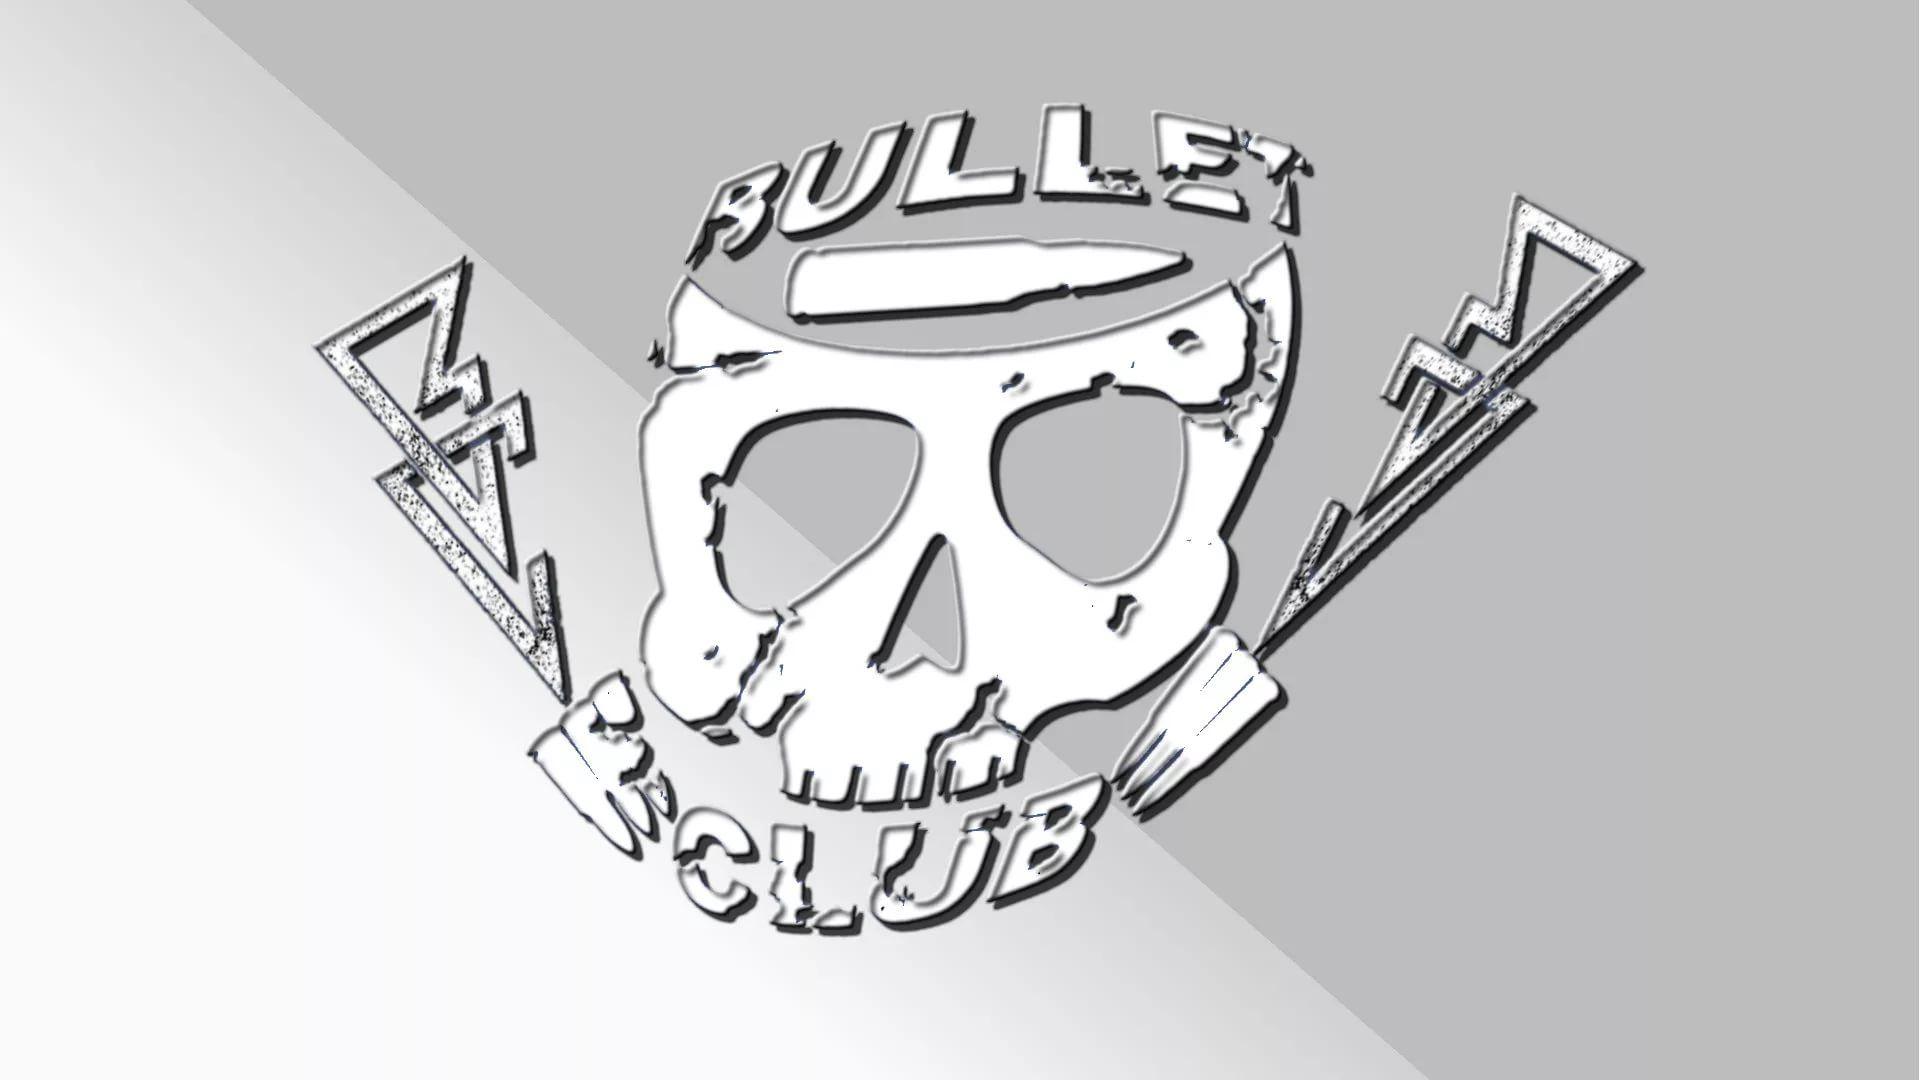 Bullet Club desktop wallpaper